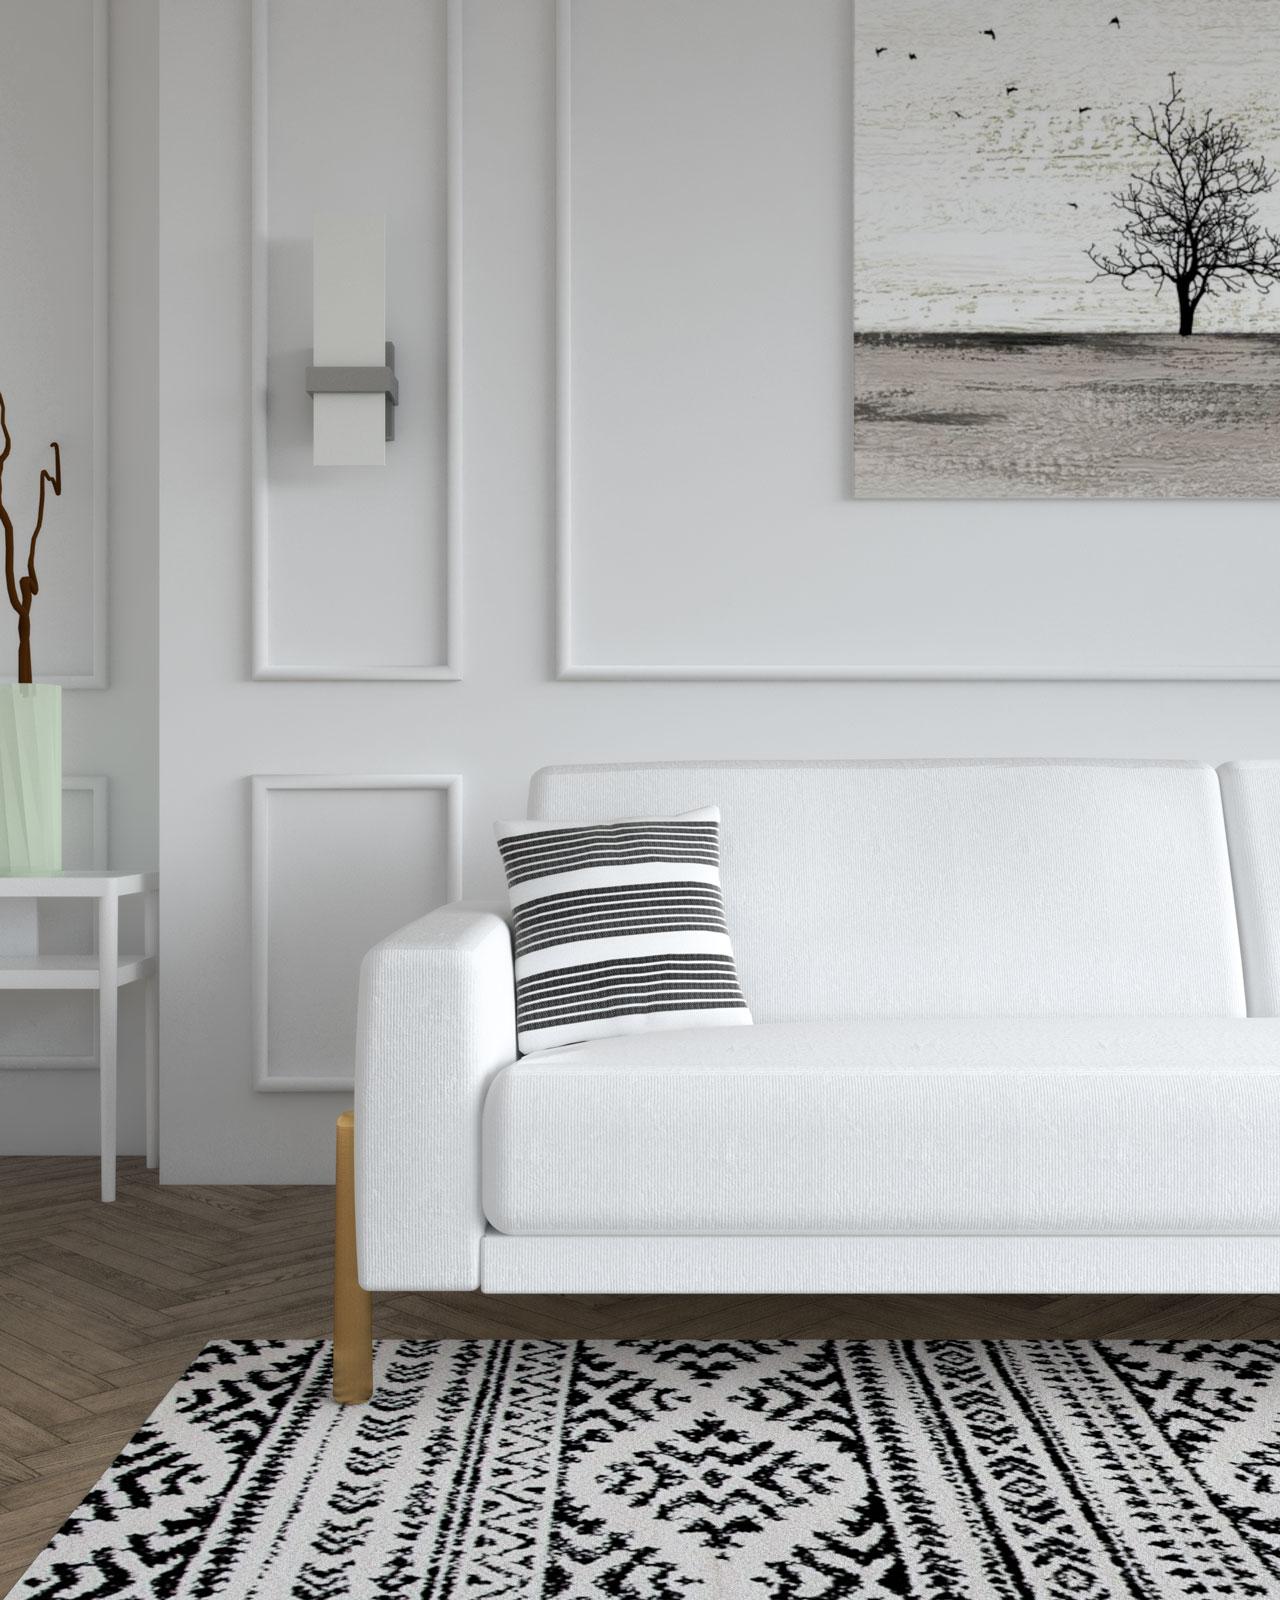 Black and white decorative throw pillow